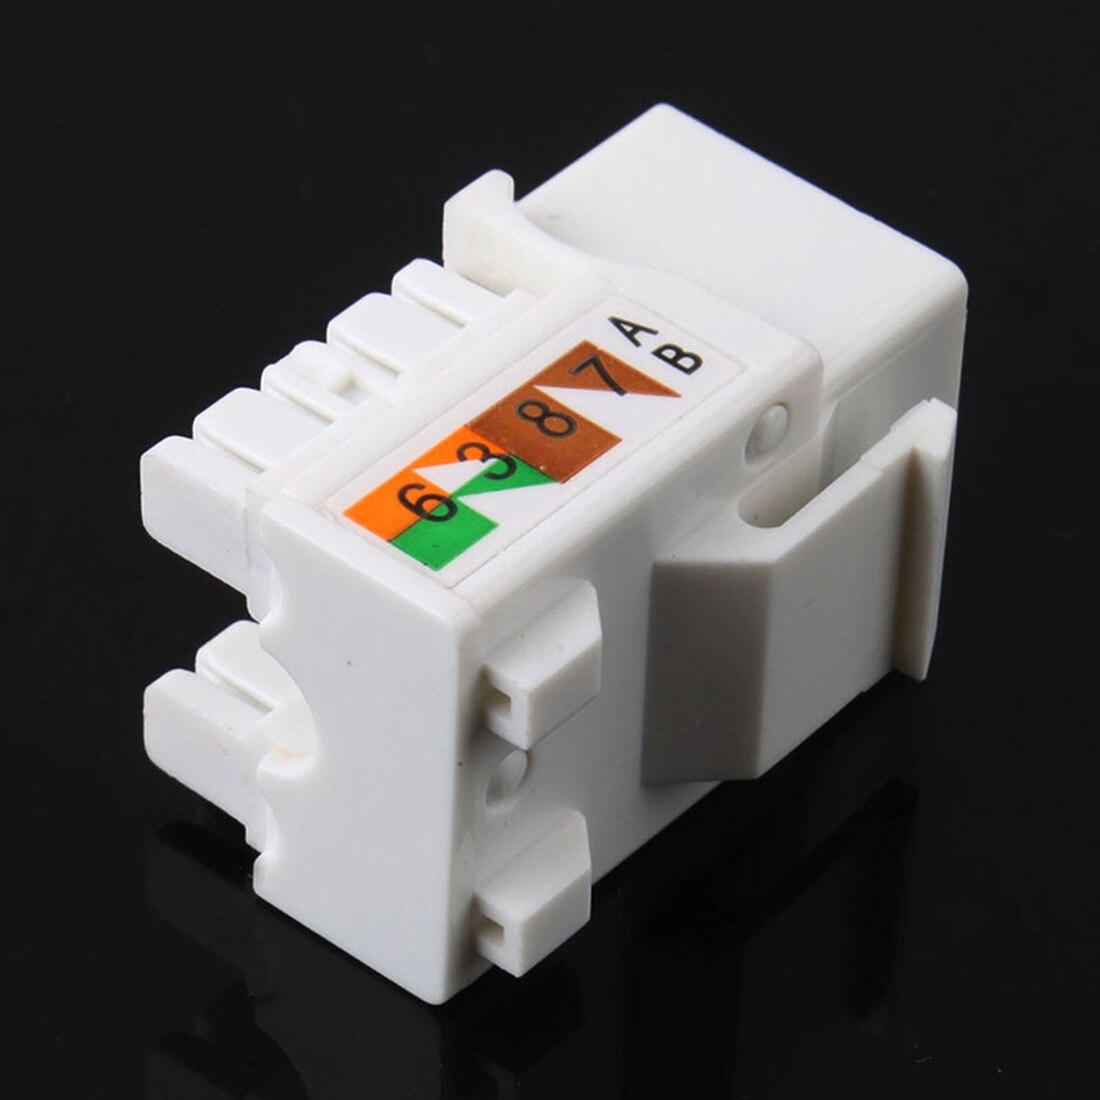 5 lot Keystone Jack Cat6 Black Network Ethernet 110 Punchdown 8P8C RJ45